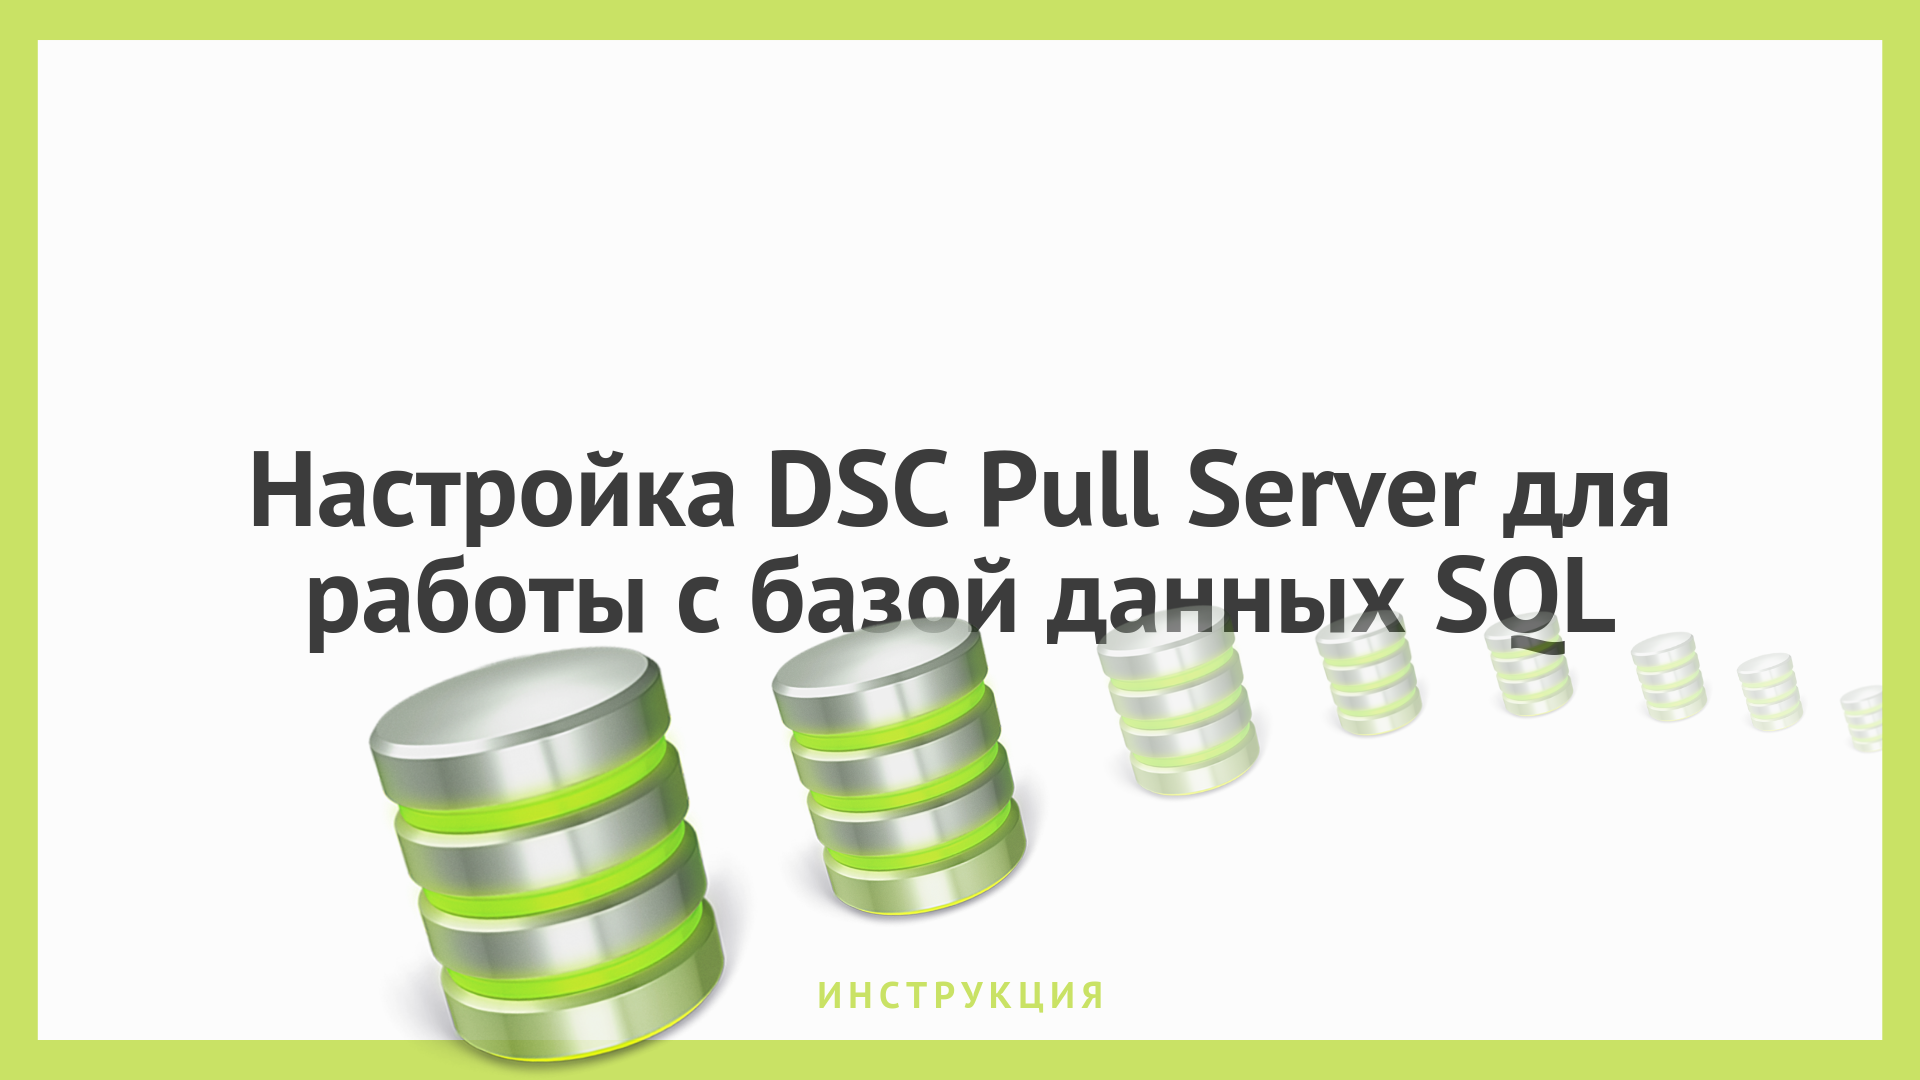 PowerShell Desired State Configuration и напильник: часть 1. Настройка DSC Pull Server для работы с базой данных SQL - 1